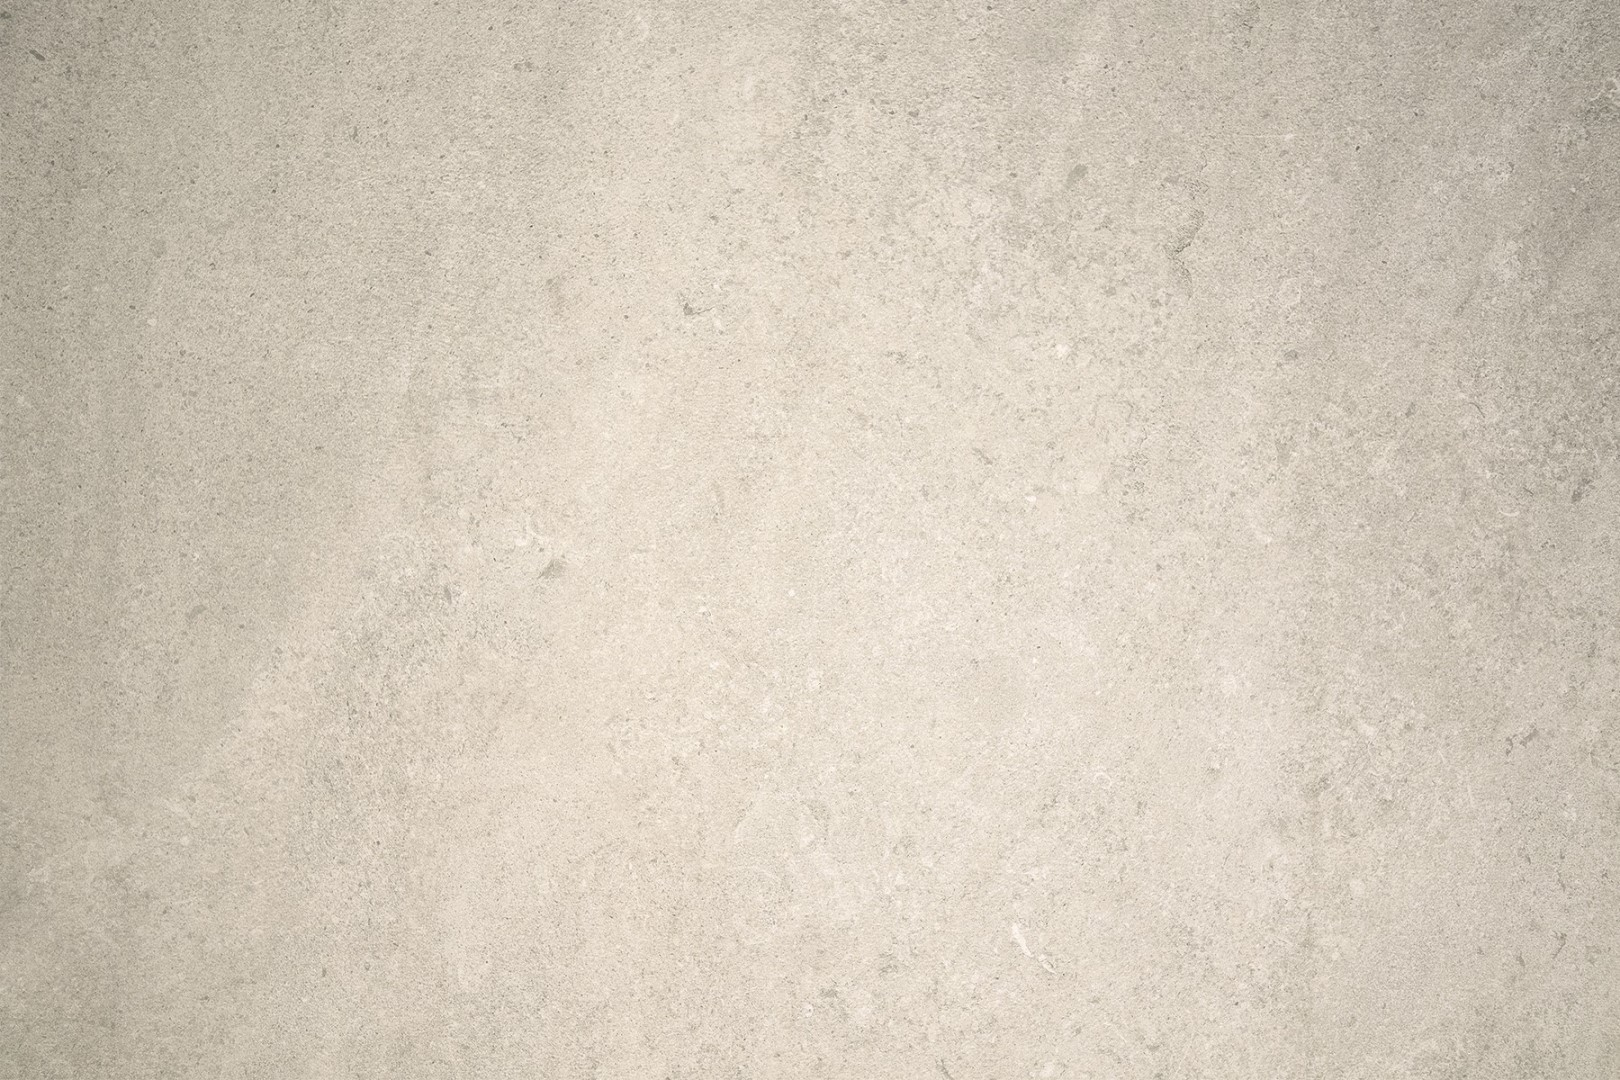 Obklad/dlažba Beige 100x250x0,6cm, matná, rektifikovaná